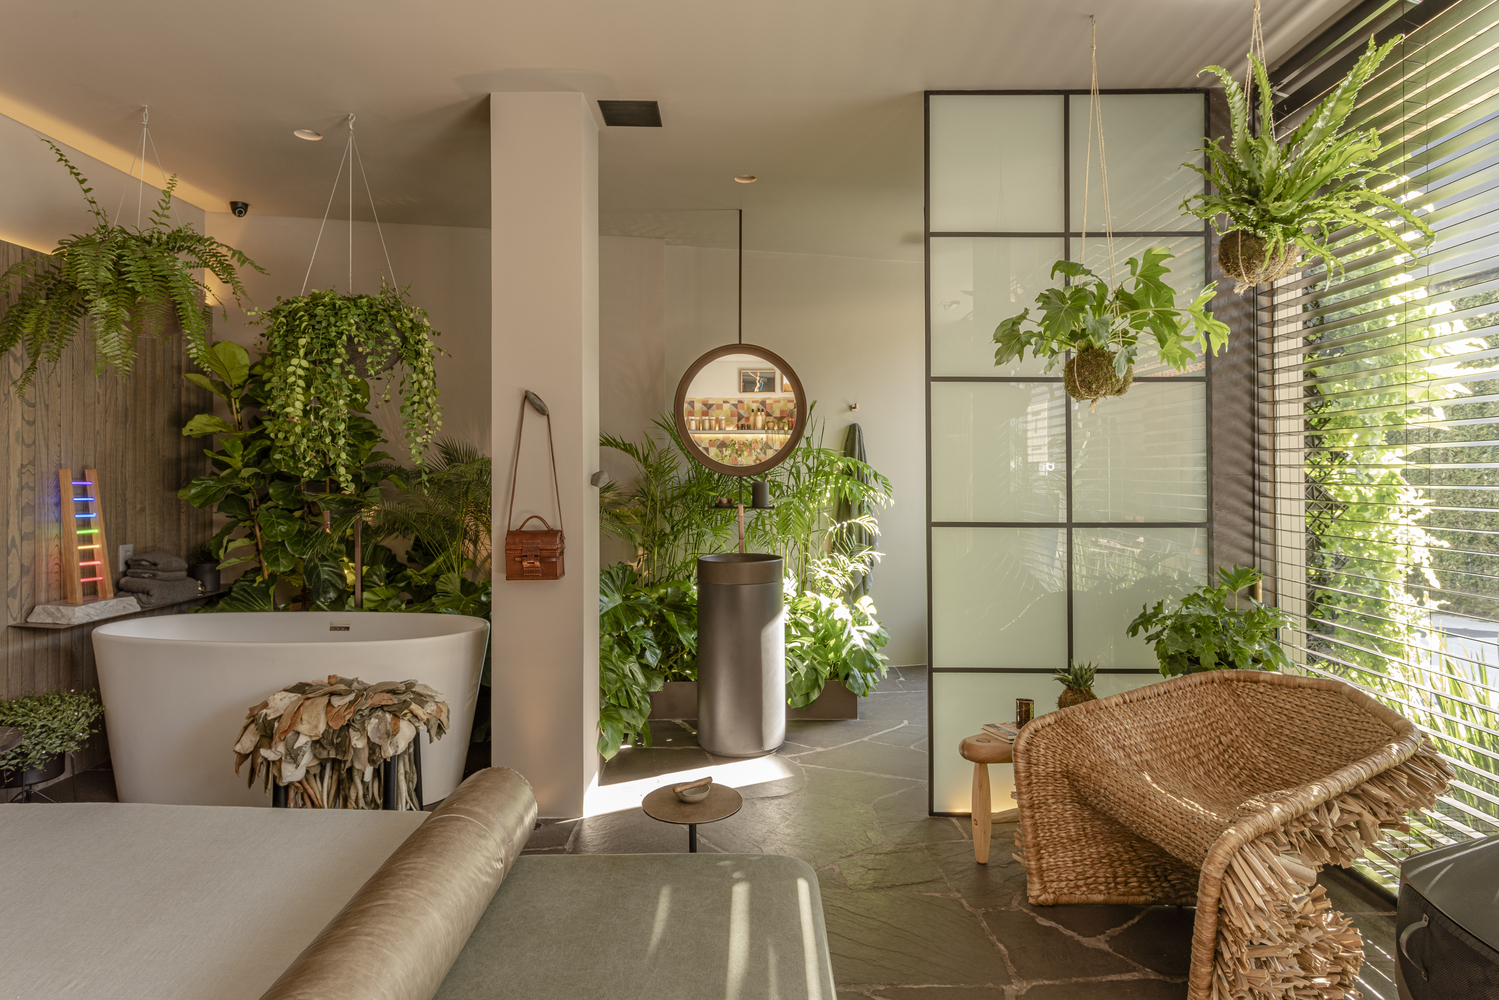 cabana urbana marcio michalua casacor sao paulo 2019 jardim suspenso vaso suspenso plantas paisagismo quarto banheiro banheira